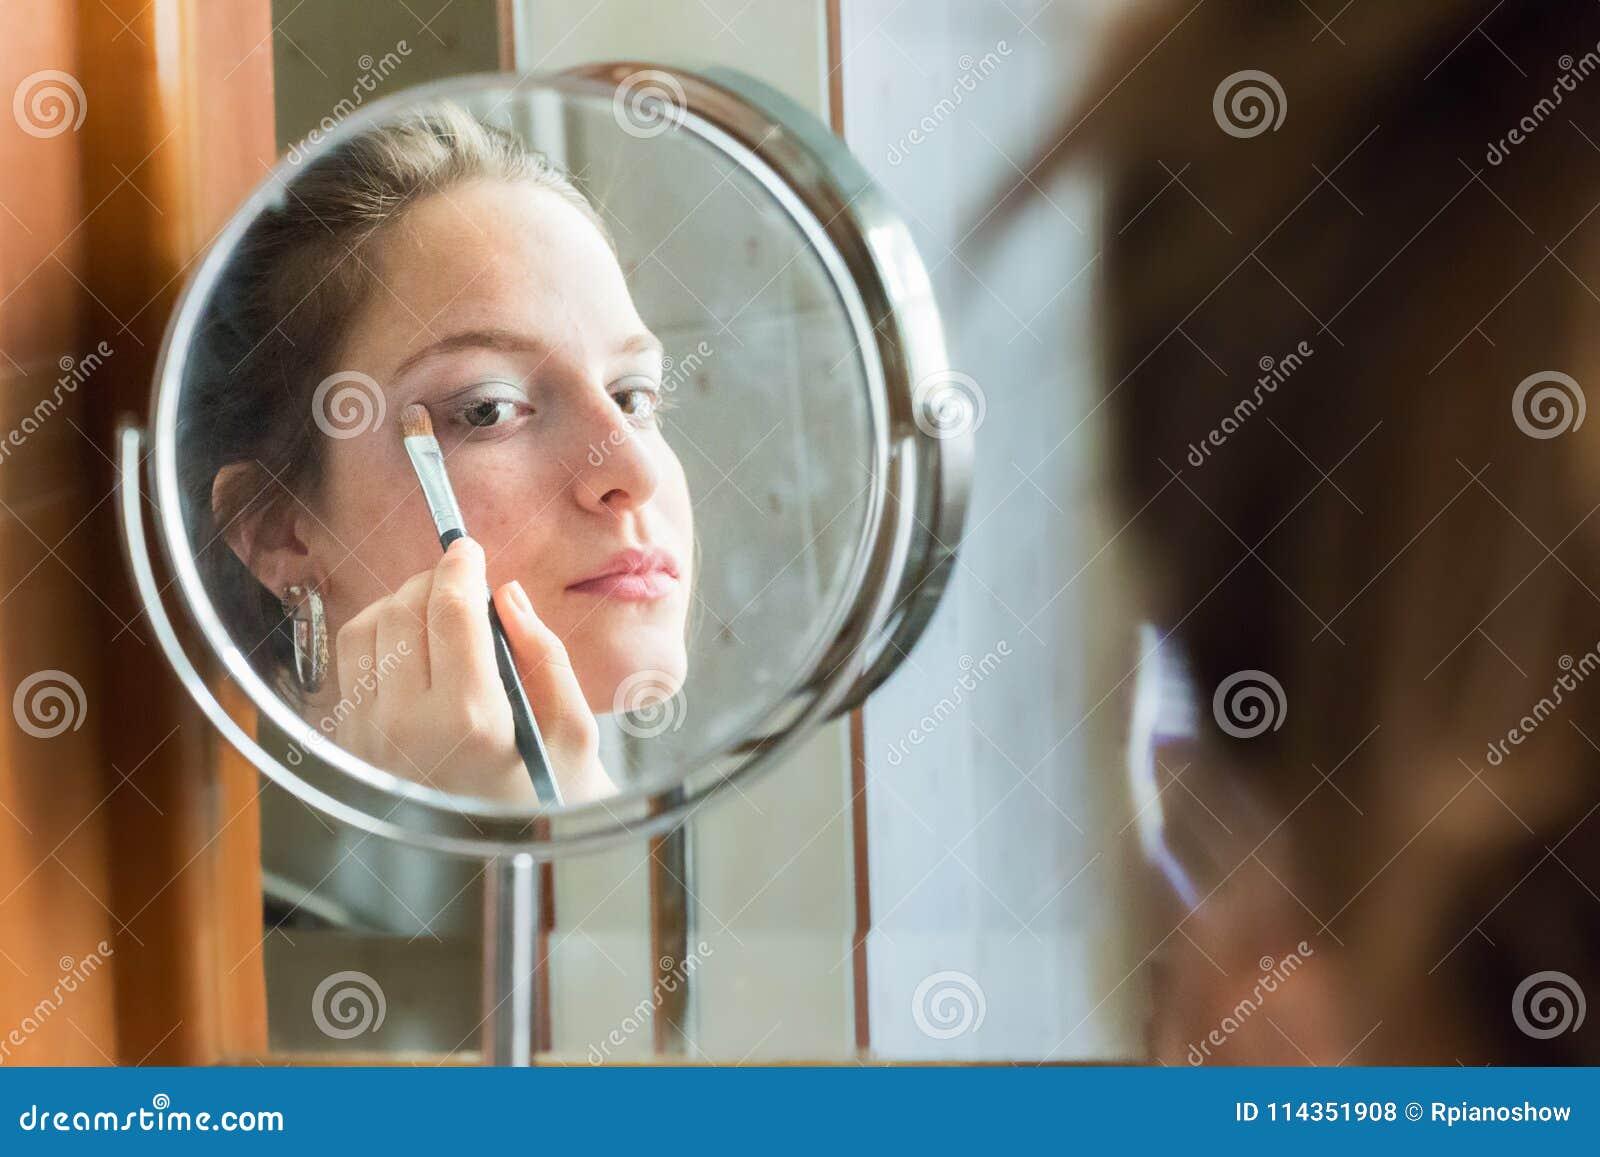 self Teen picture mirror girl